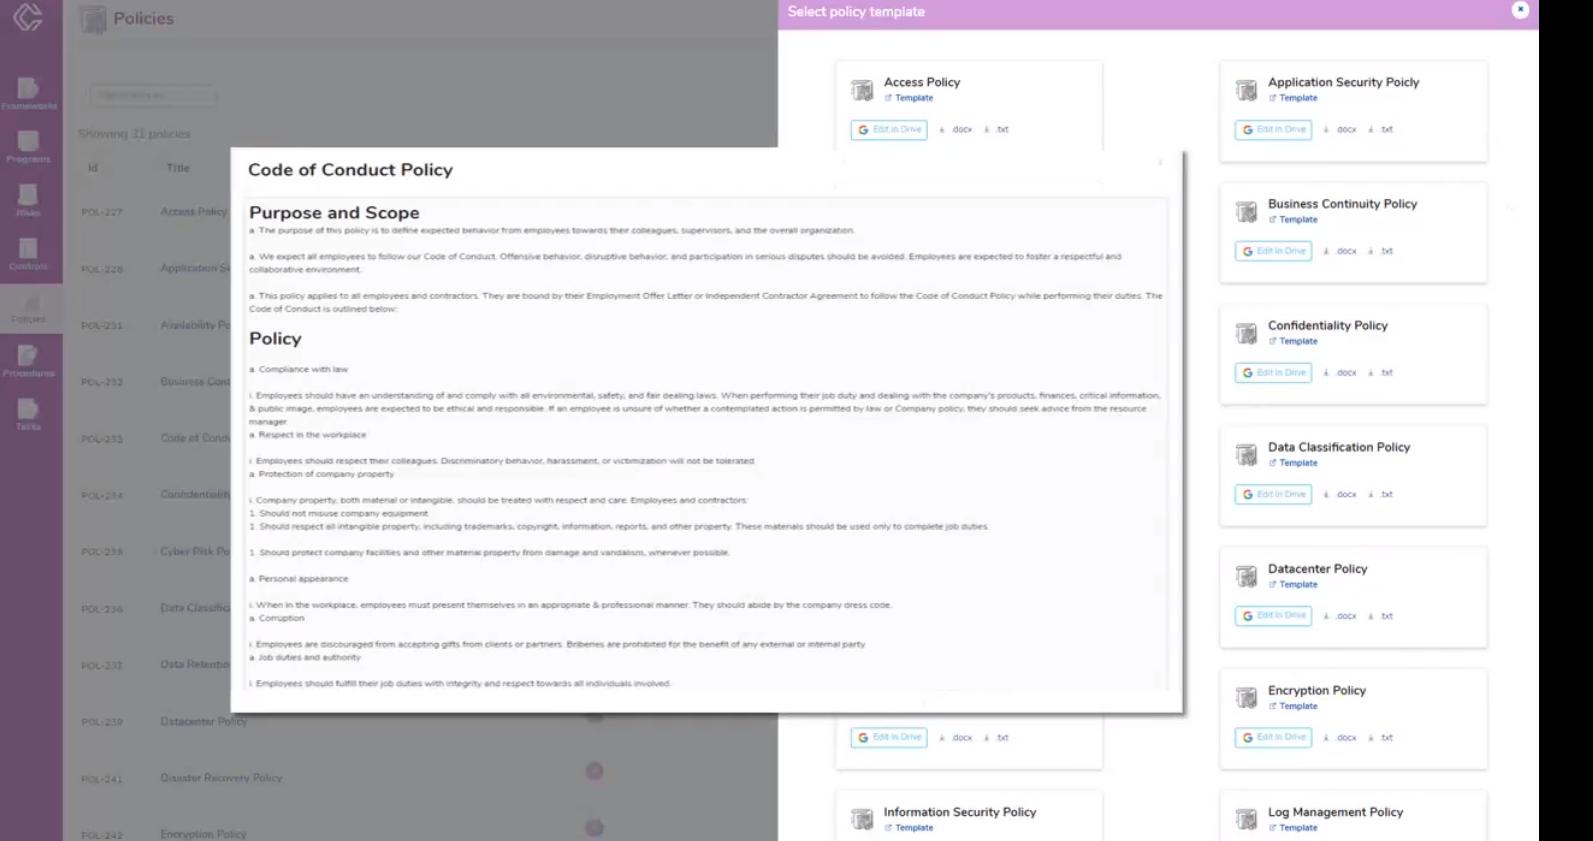 ControlMap policies